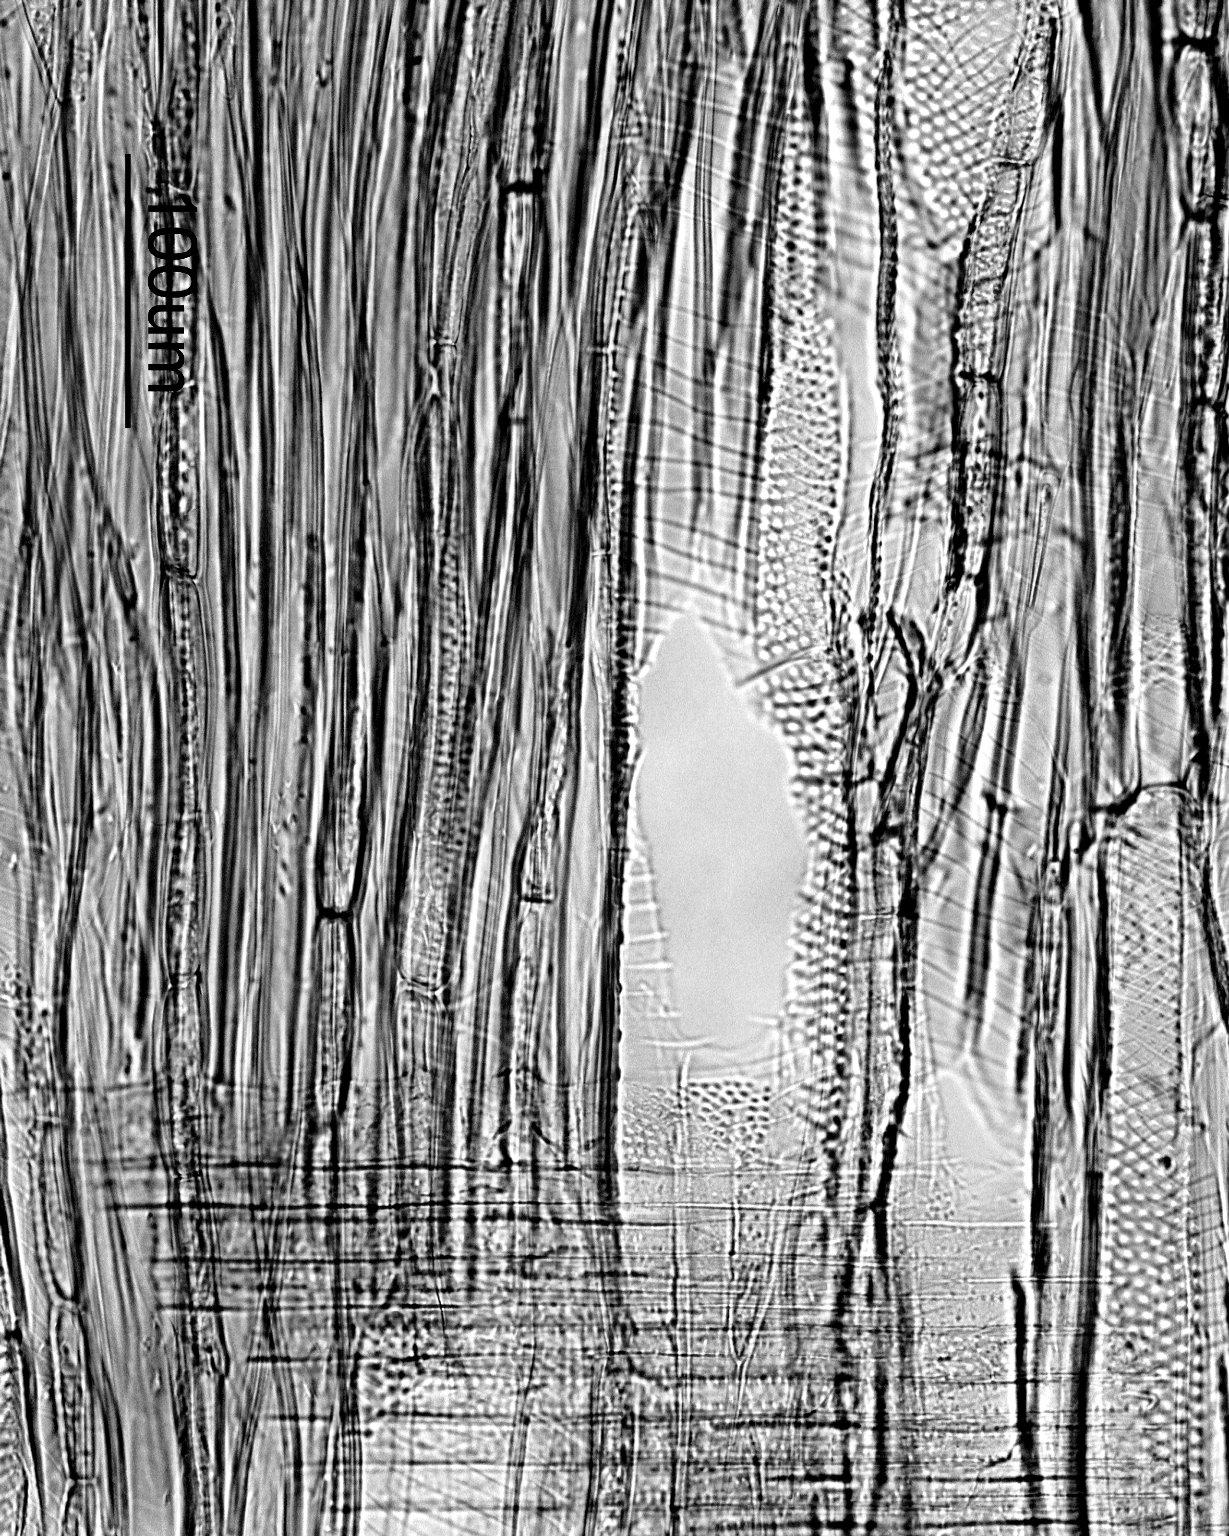 MALVACEAE TILIOIDEAE Tilia japonica